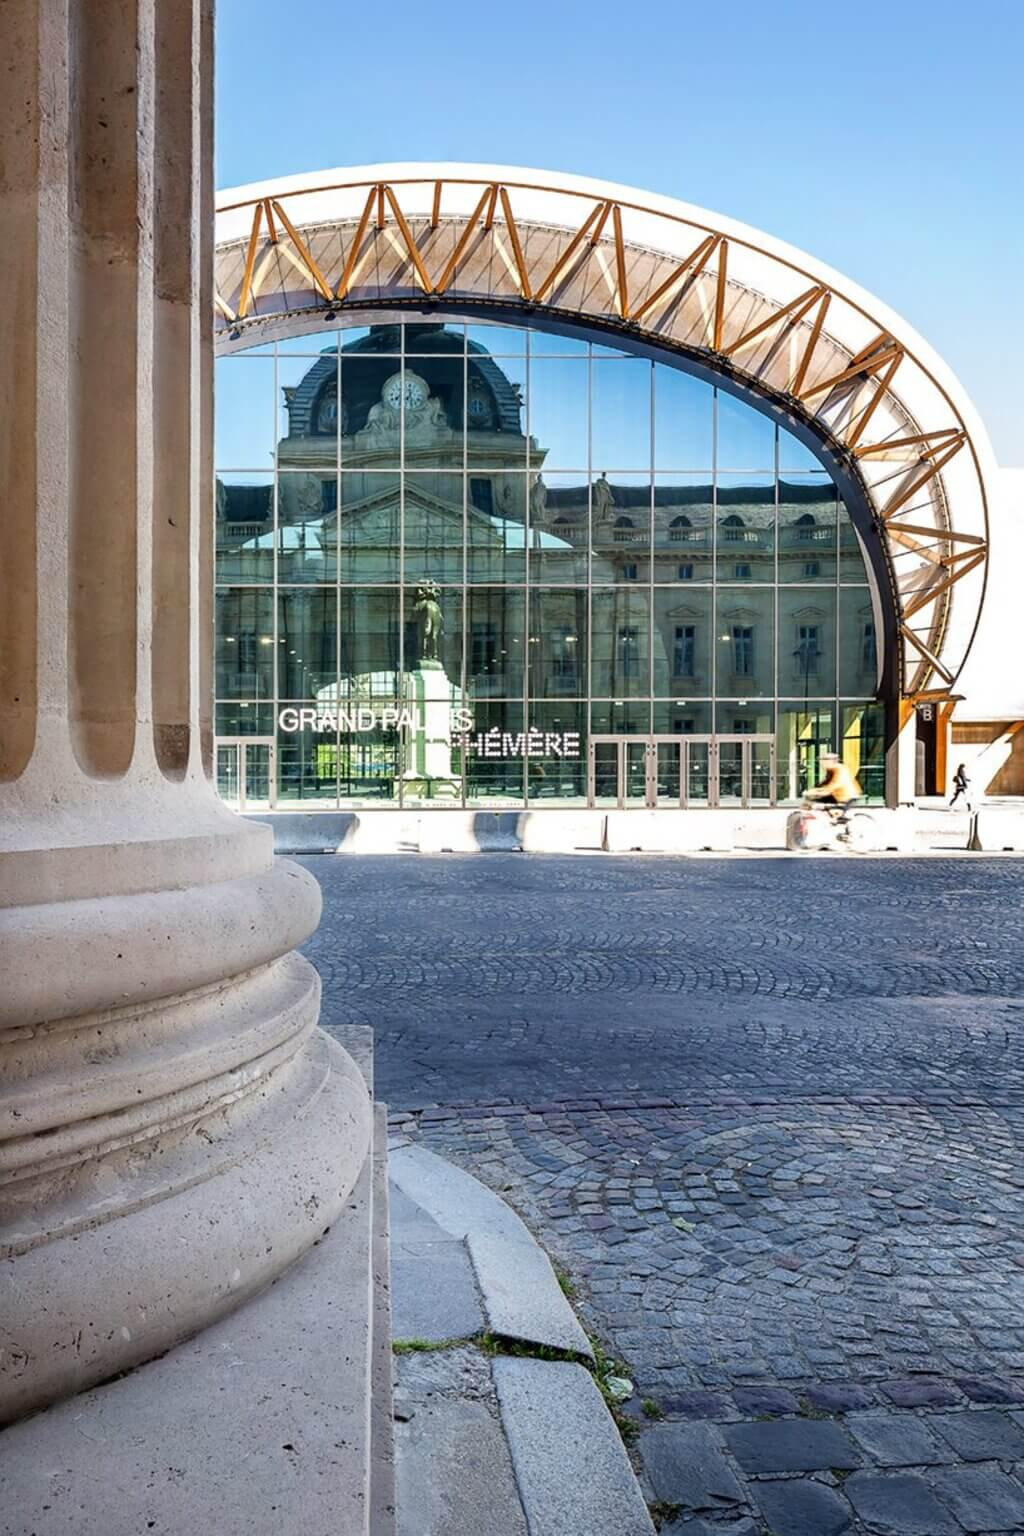 The Grand Palais Ephemere